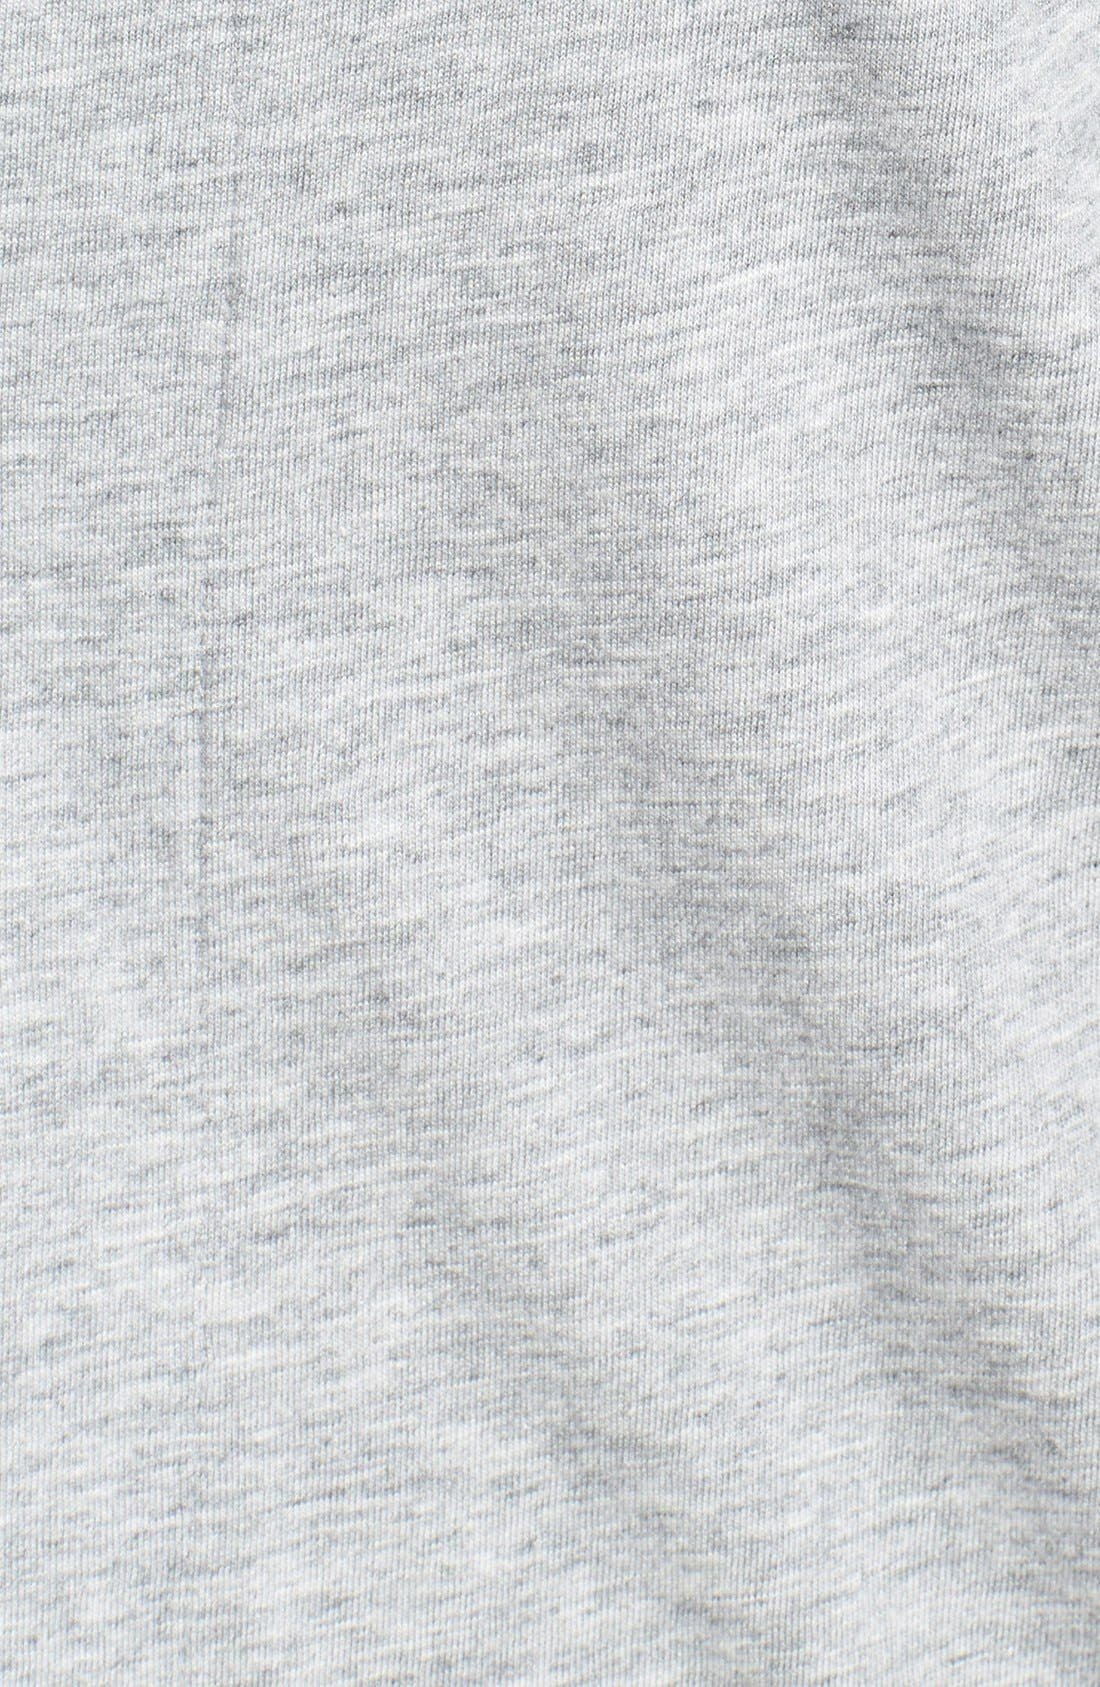 Alternate Image 3  - Lauren Ralph Lauren Knit Nightshirt (Plus Size) (Online Only)